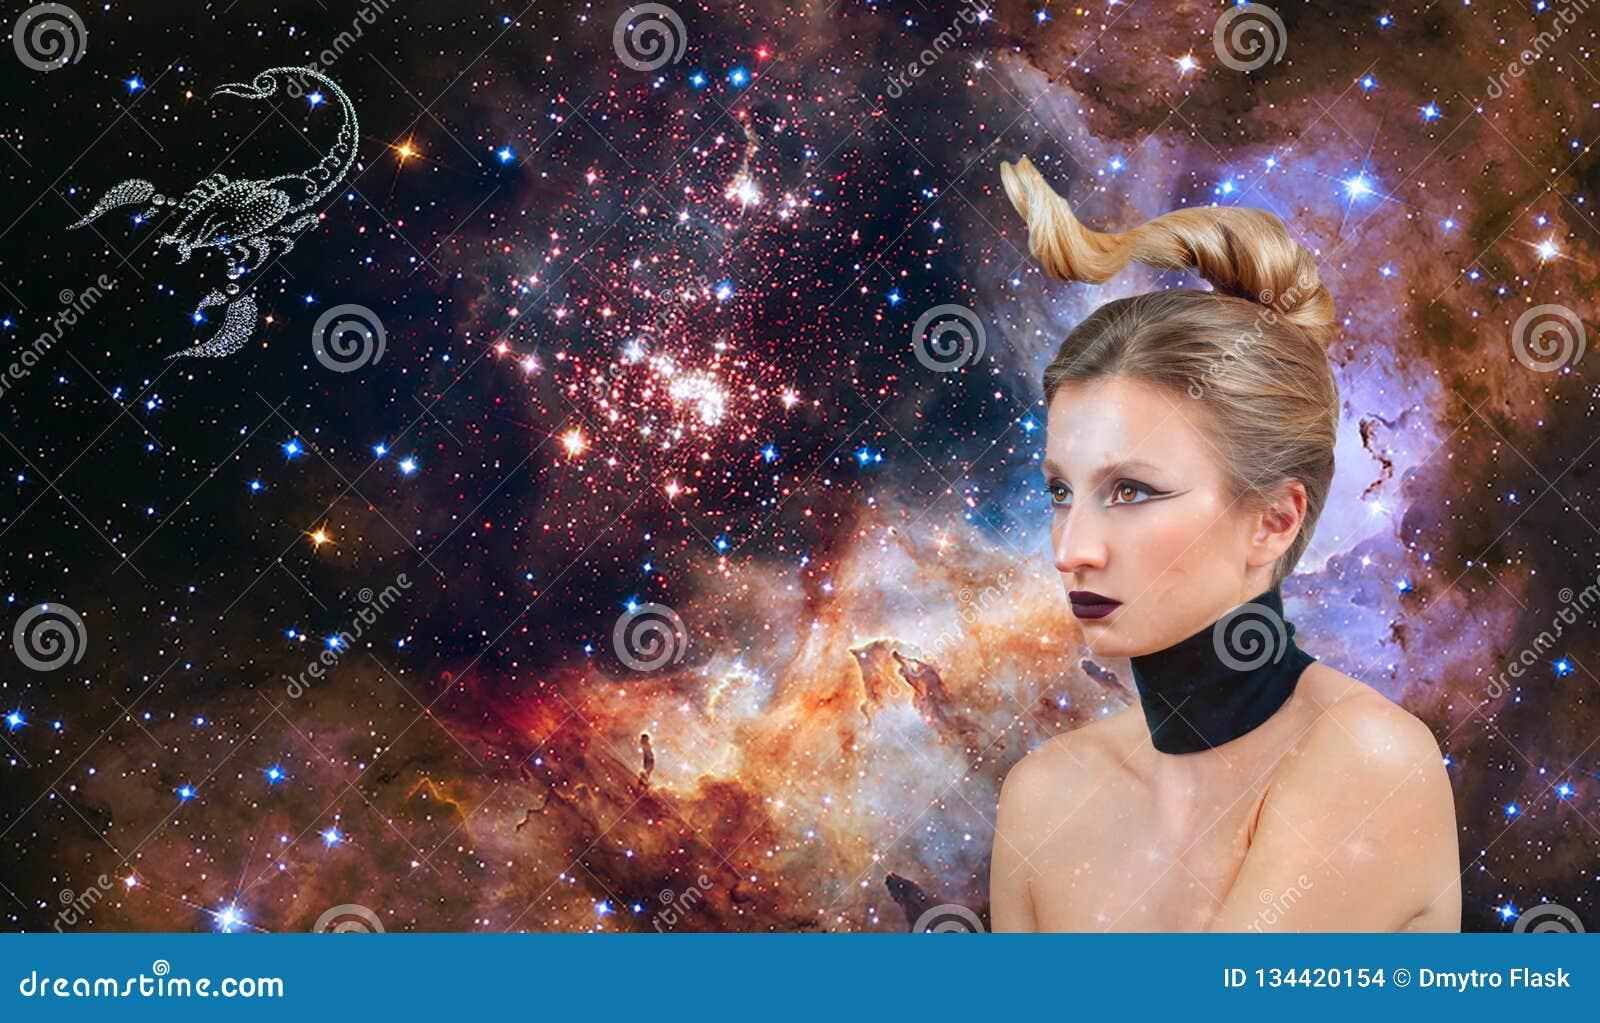 Scorpio Zodiac Sign Astrology And Horoscope Beautiful Woman Scorpio On The Galaxy Background Stock Photo Image Of Mystic Capricorn 134420154